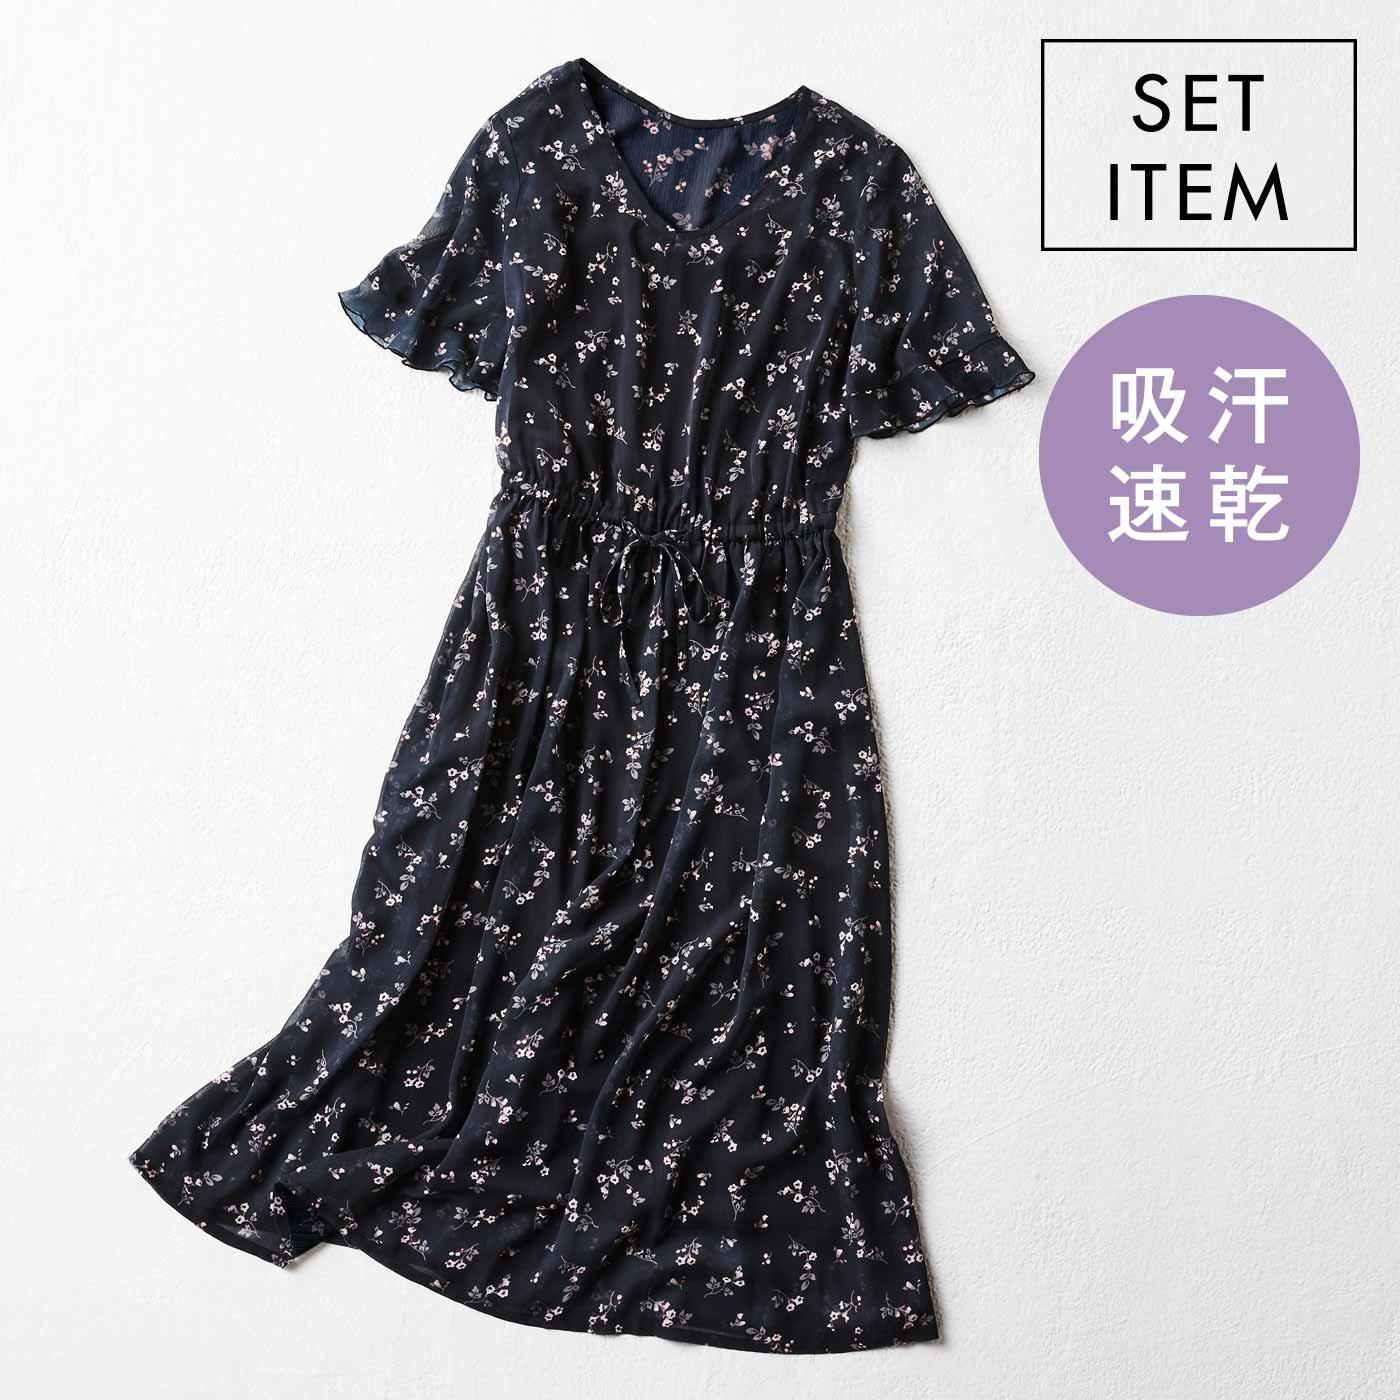 IEDIT 吸汗速乾キャミドレス付き フラワープリントワンピース〈ブラック〉